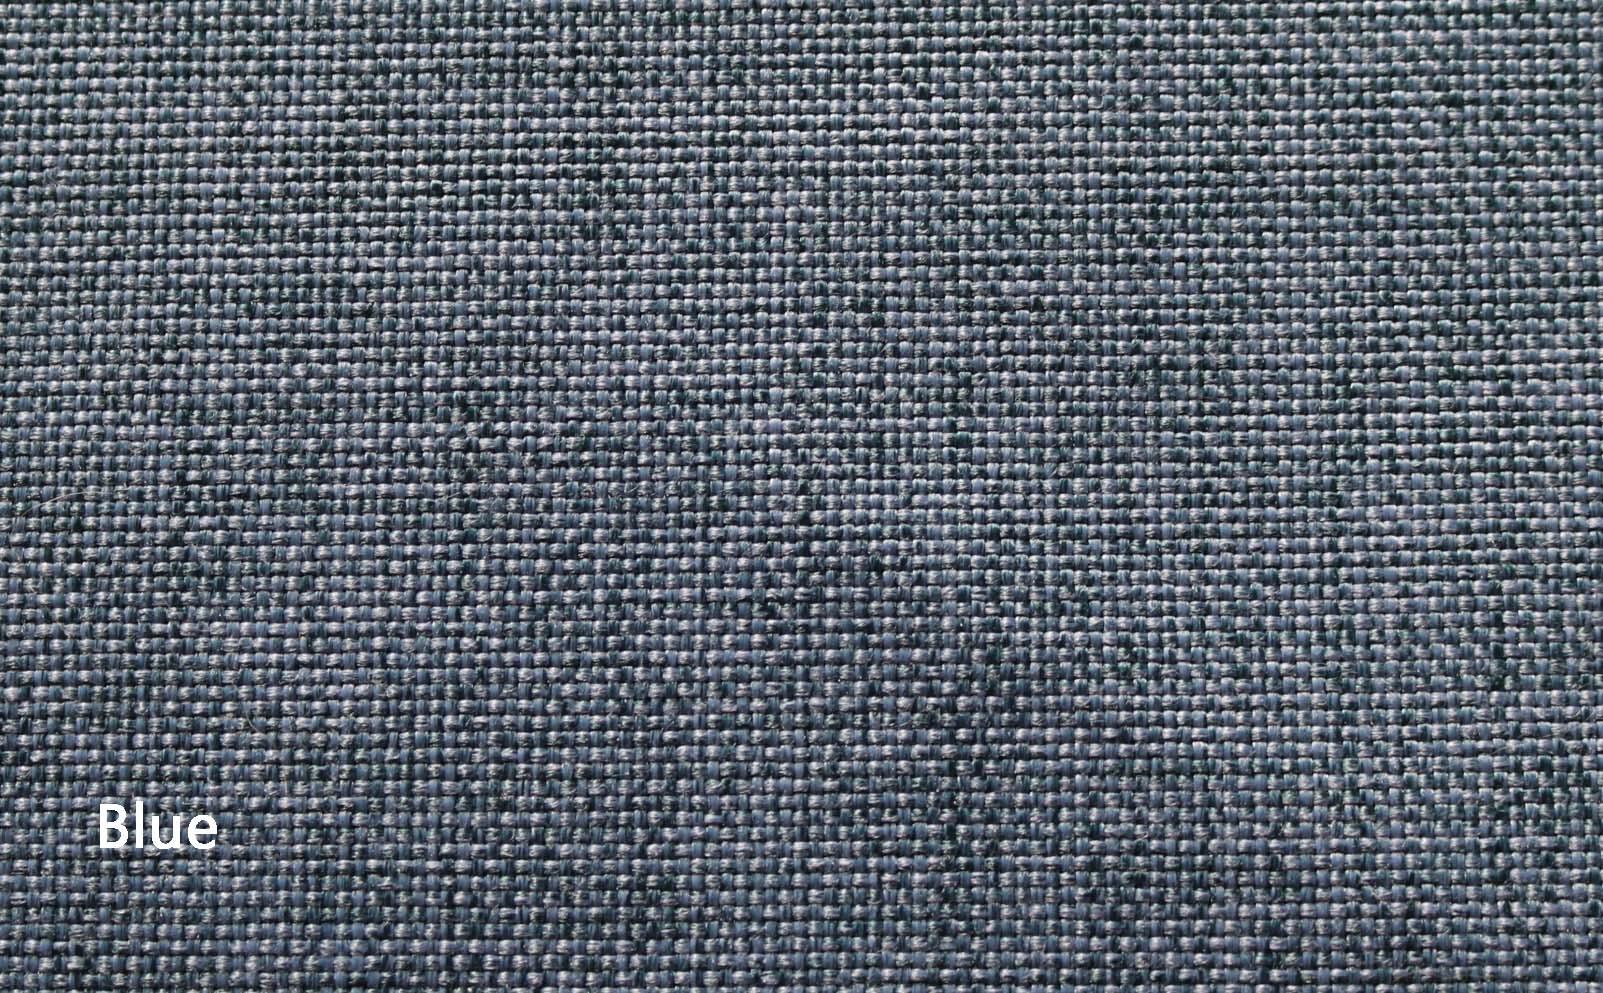 fabric blue.jpg